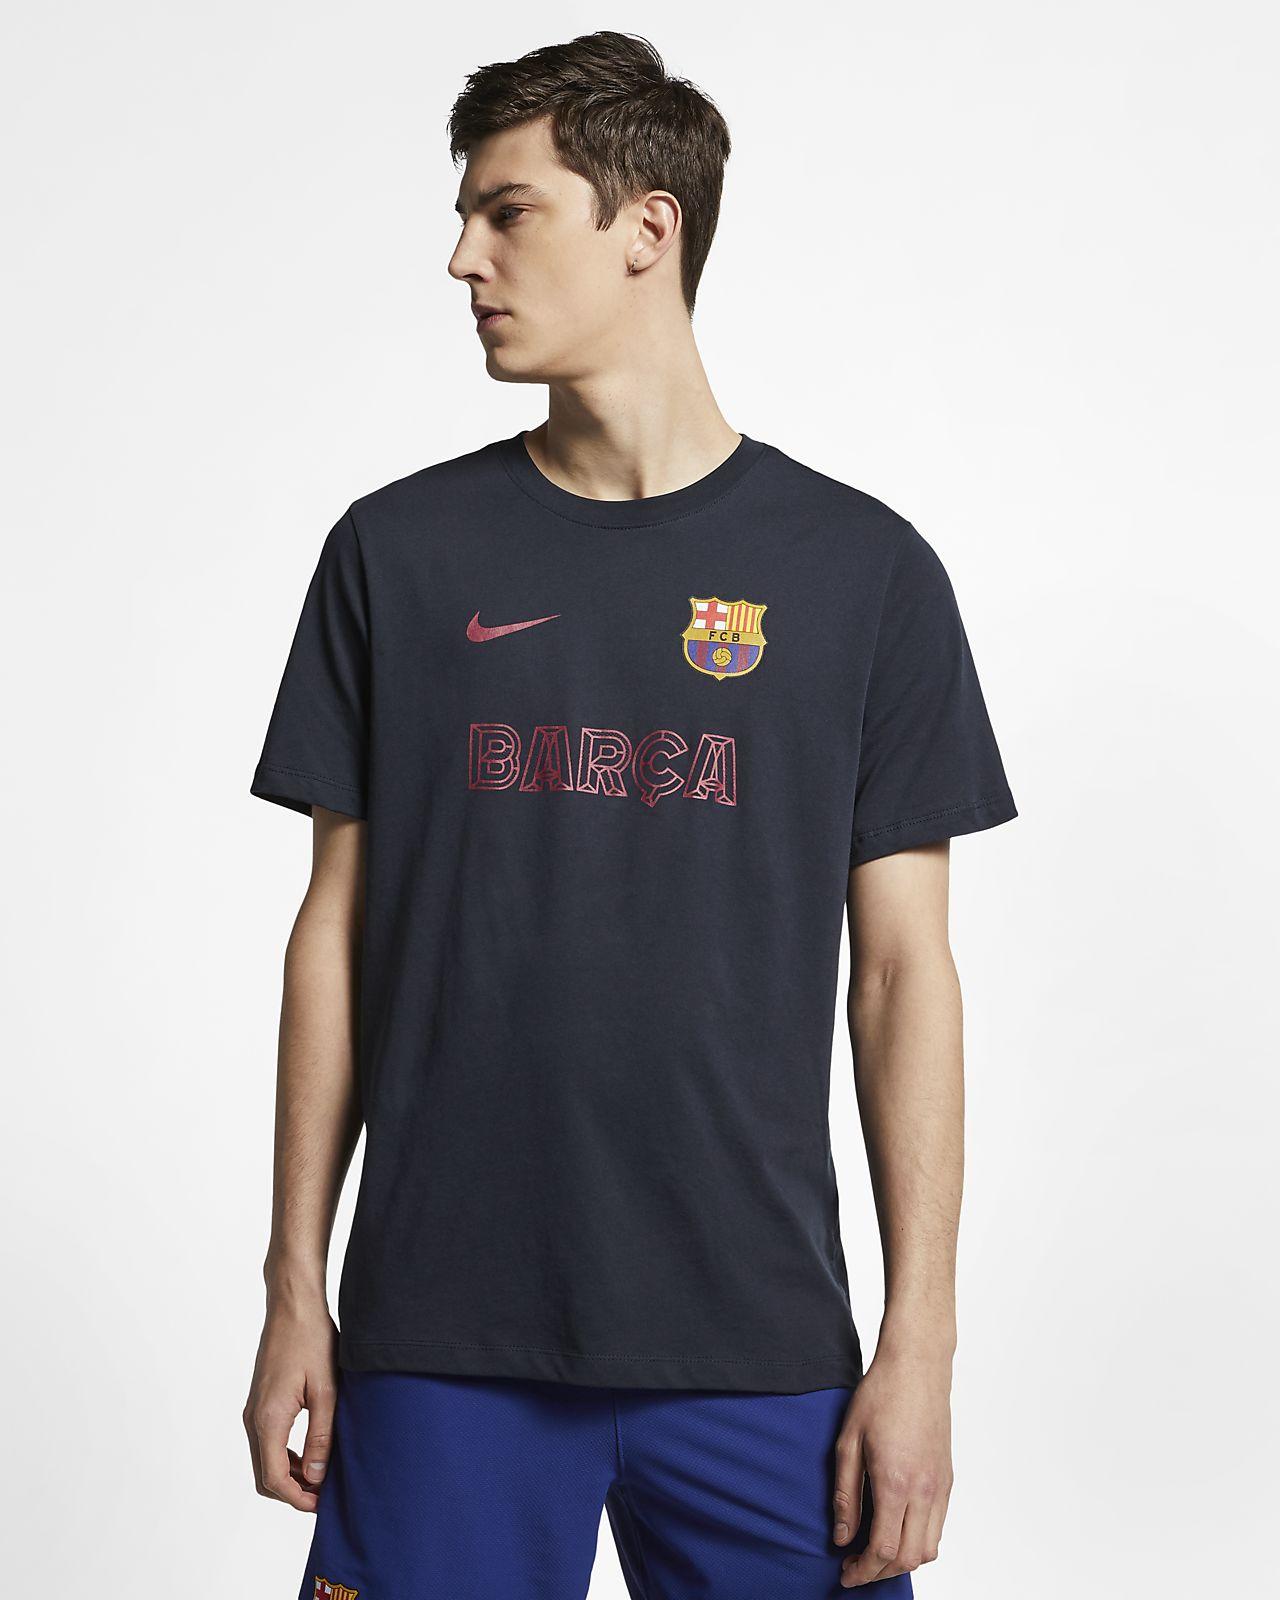 Tee-shirt Nike FC Barcelona pour Homme